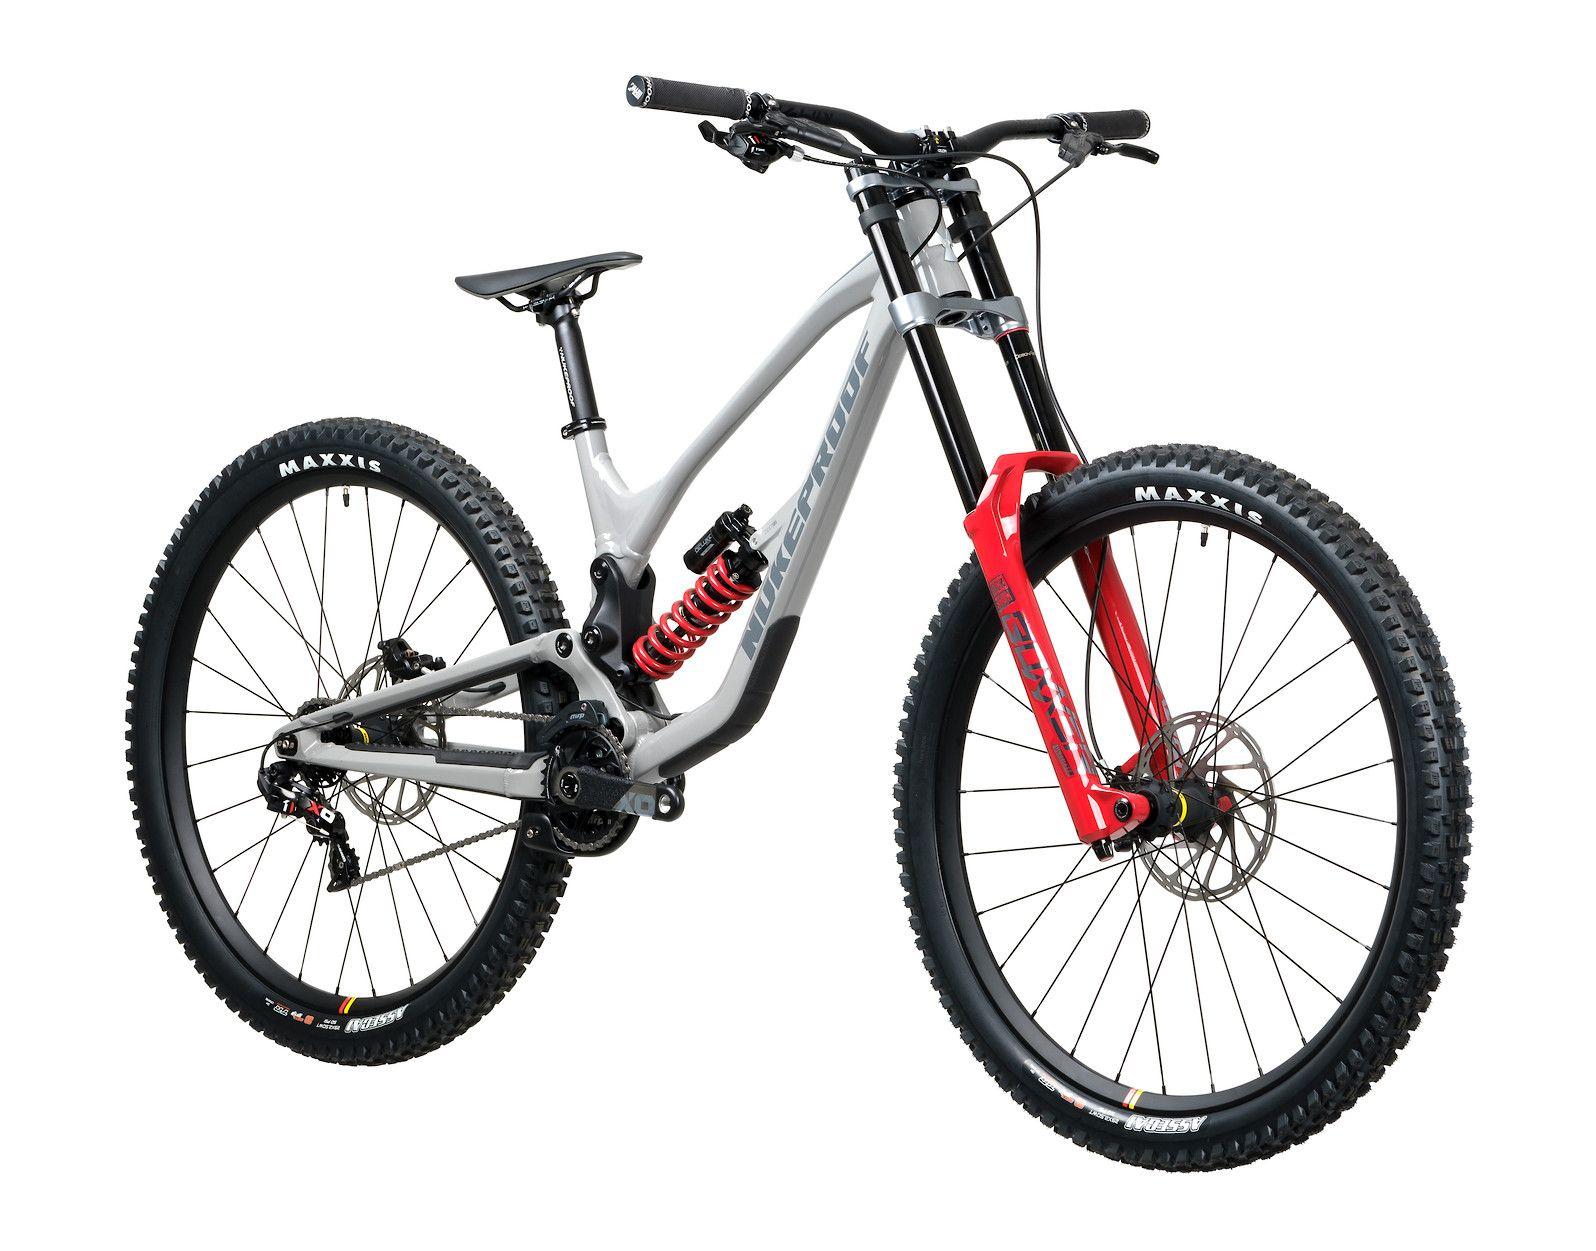 "Nukeproof Dissent 290 RS 29"" Downhillbike DH MTB Mountainbike Fahrrad"